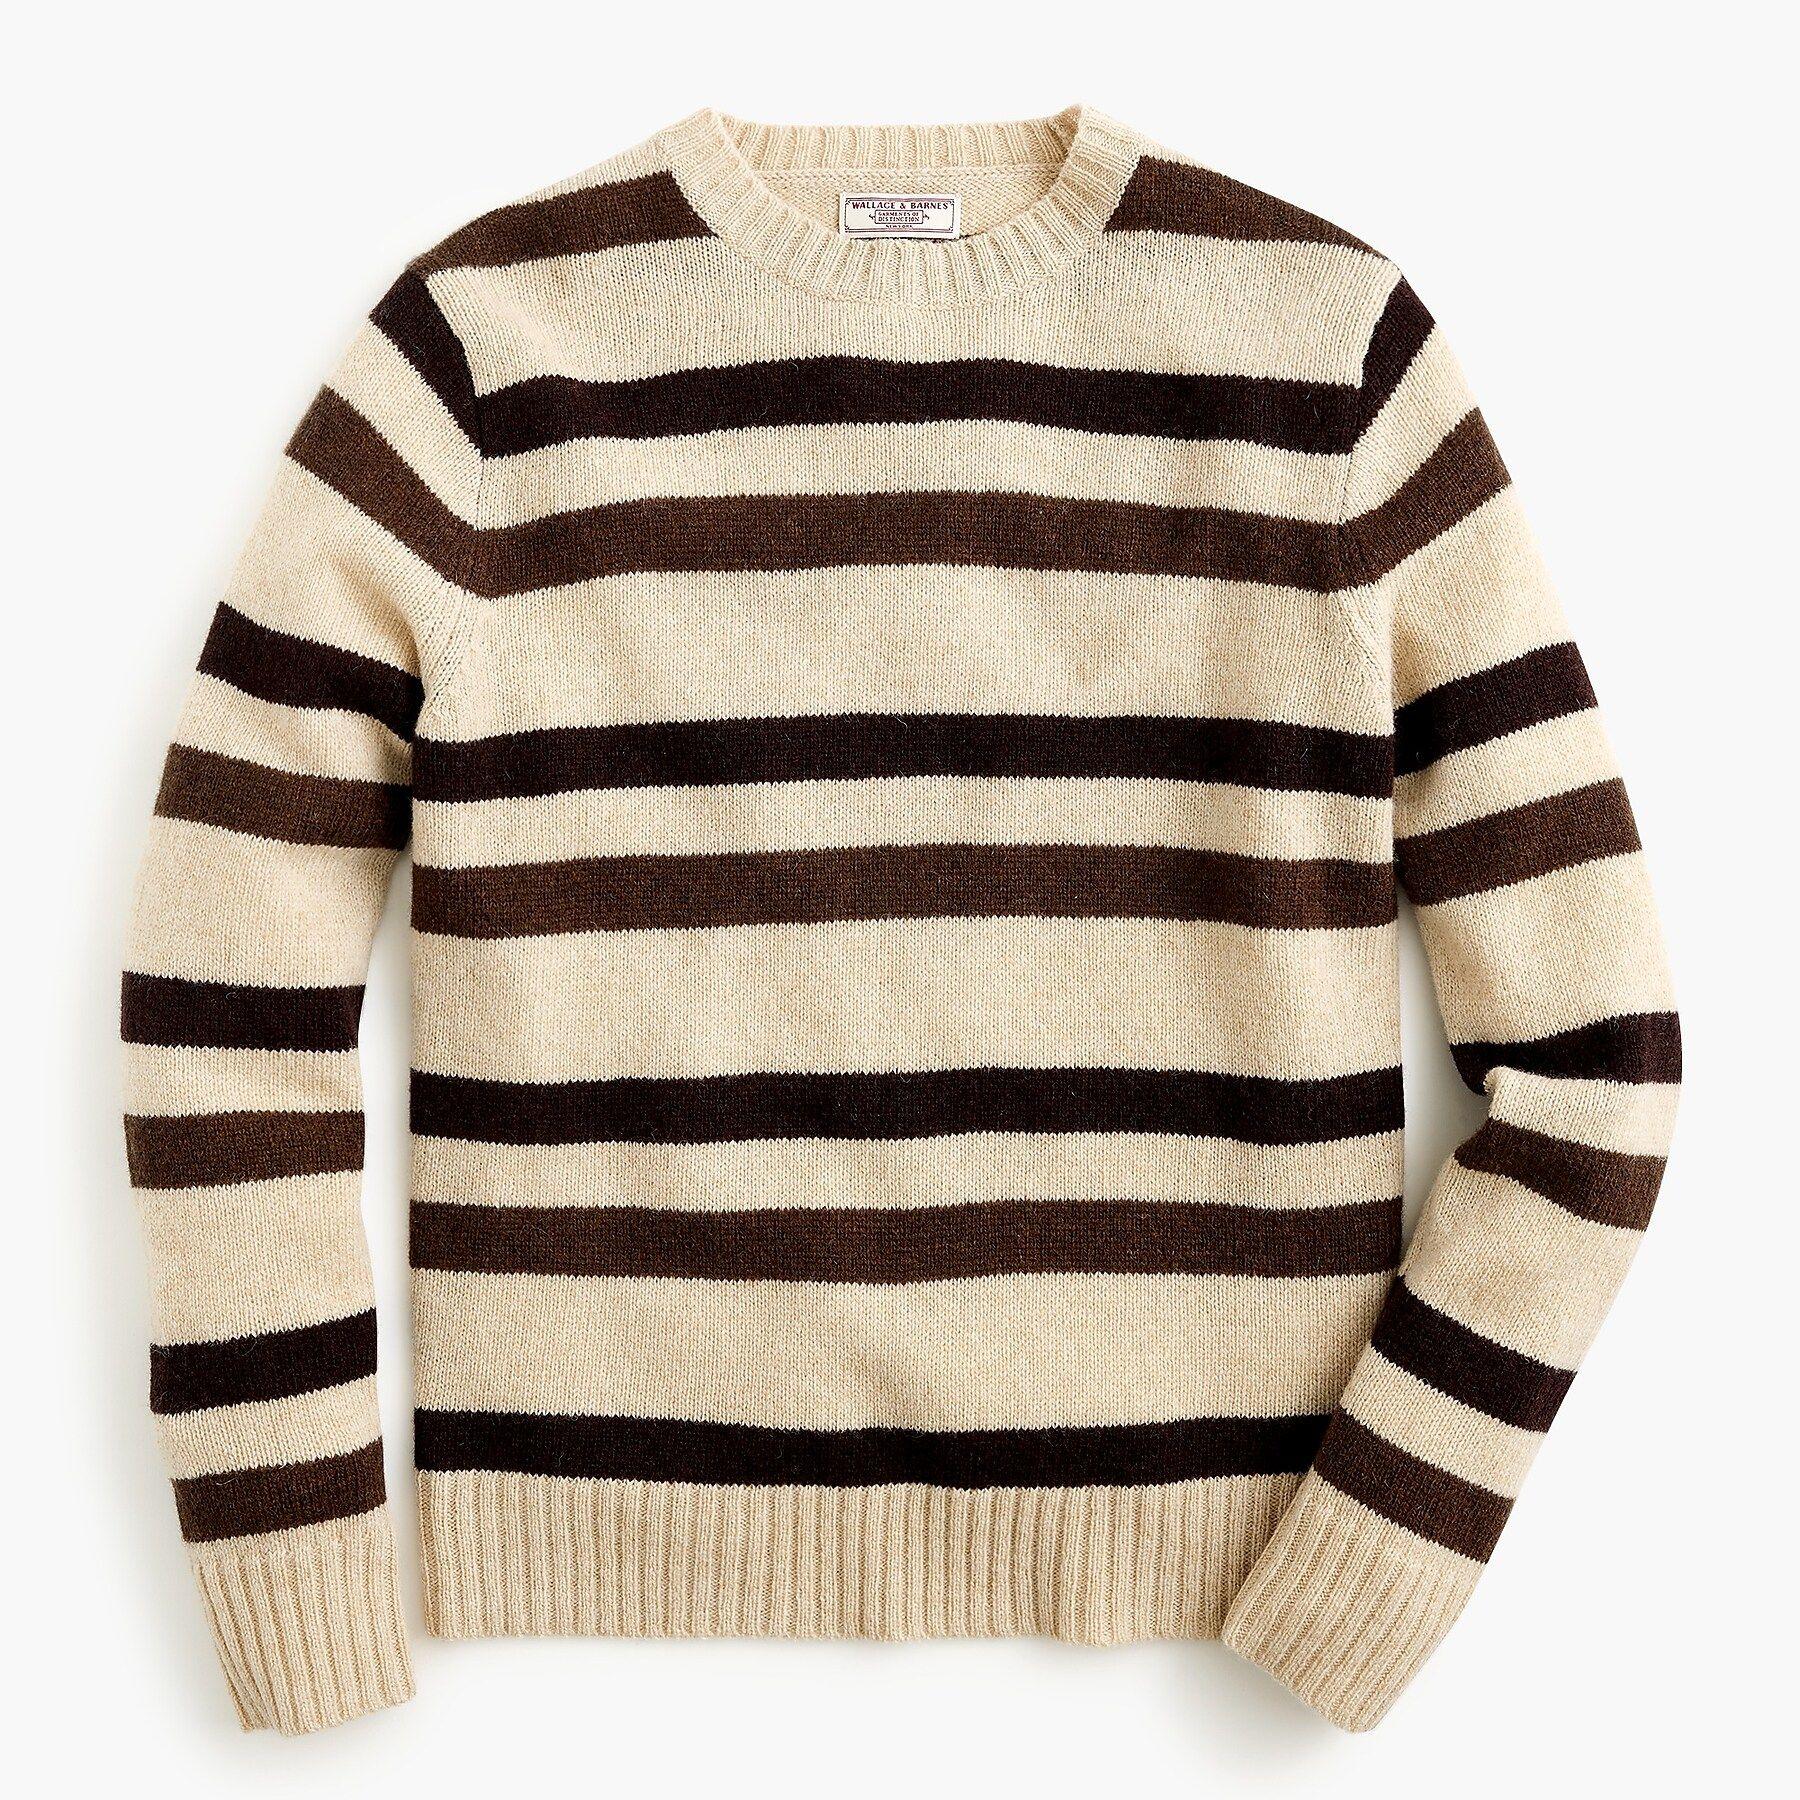 J.Crew: Wallace & Barnes Striped Crewneck Wool Sweater ...